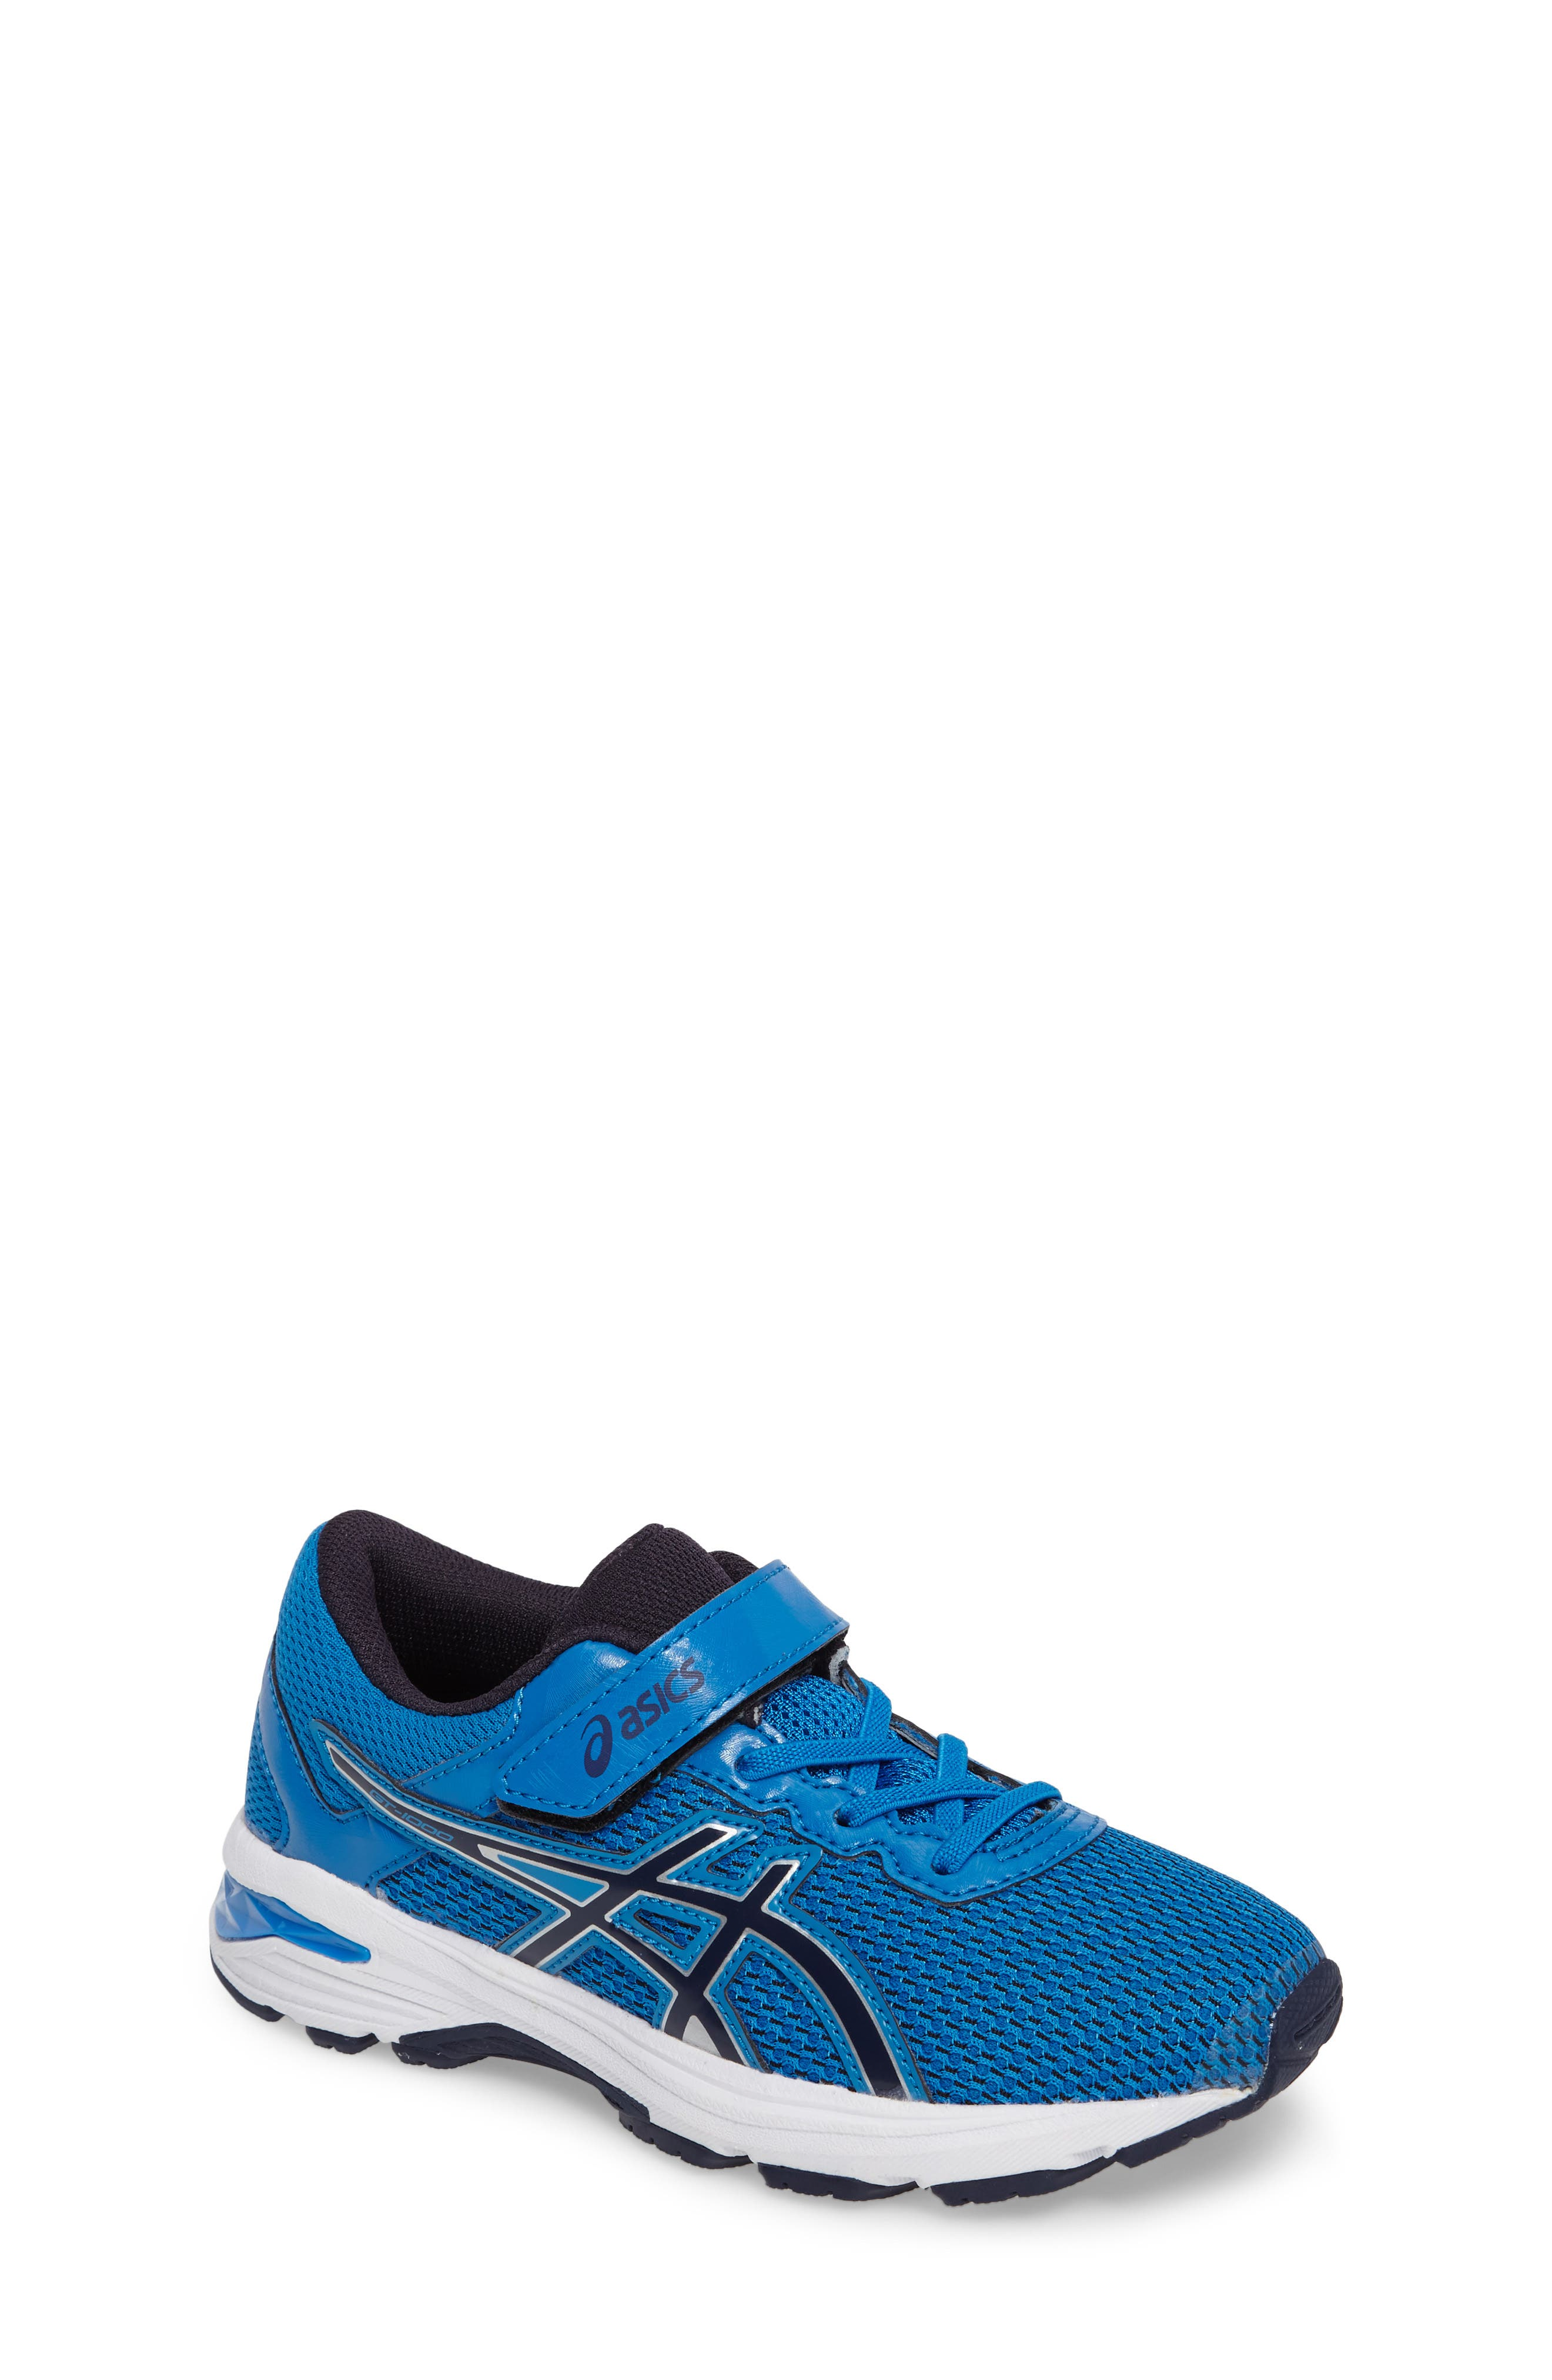 Asics GT-1000<sup>™</sup> 6 PS Sneaker,                             Main thumbnail 1, color,                             Blue/ Peacock